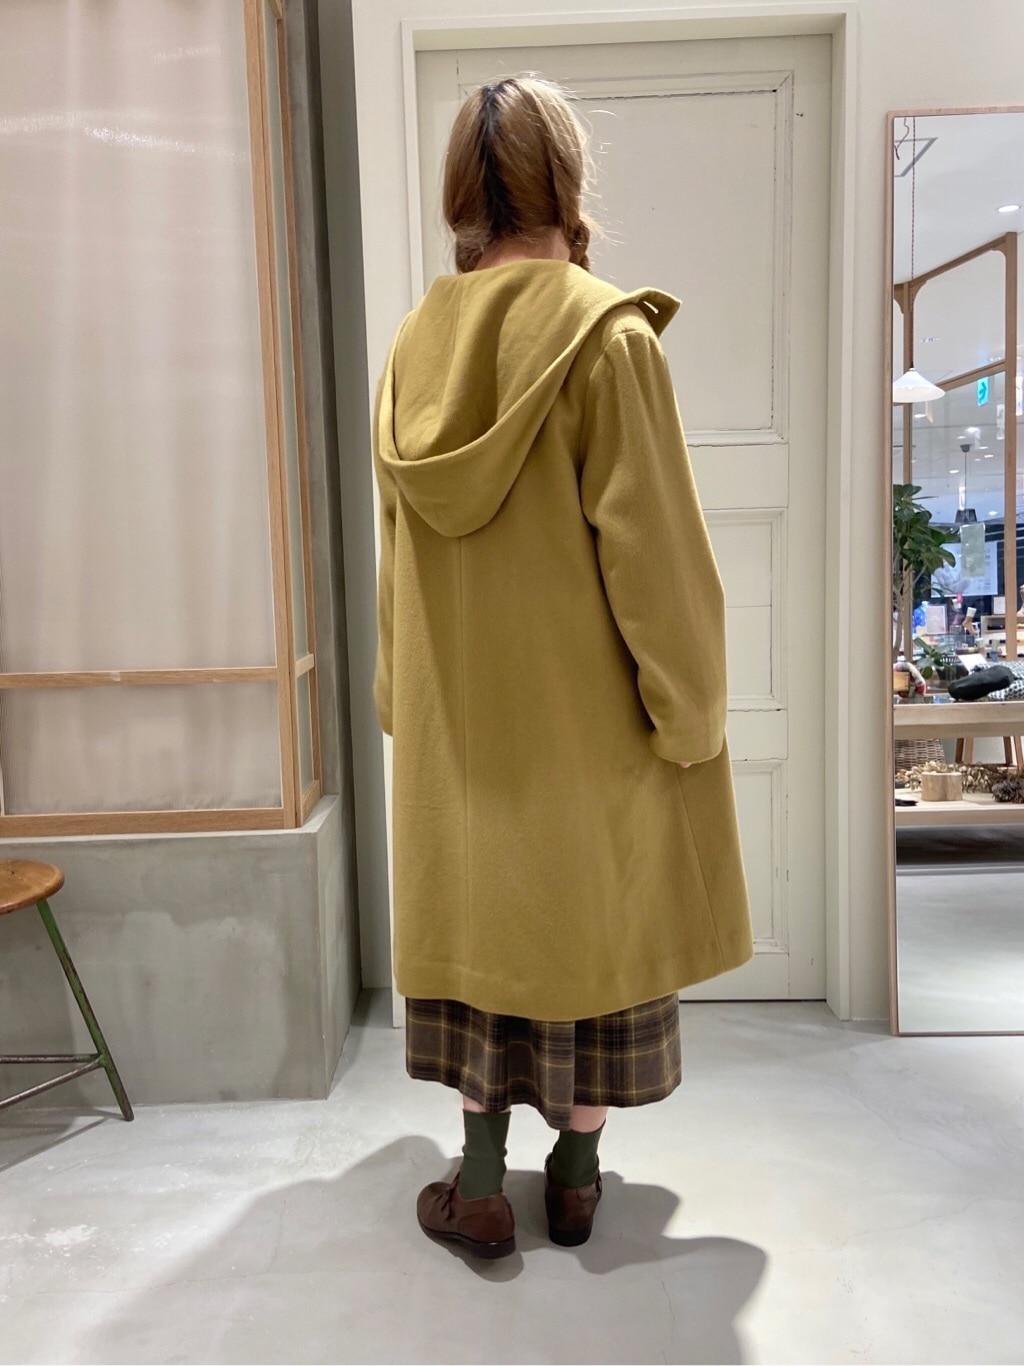 bulle de savon 渋谷スクランブルスクエア 身長:160cm 2020.10.12